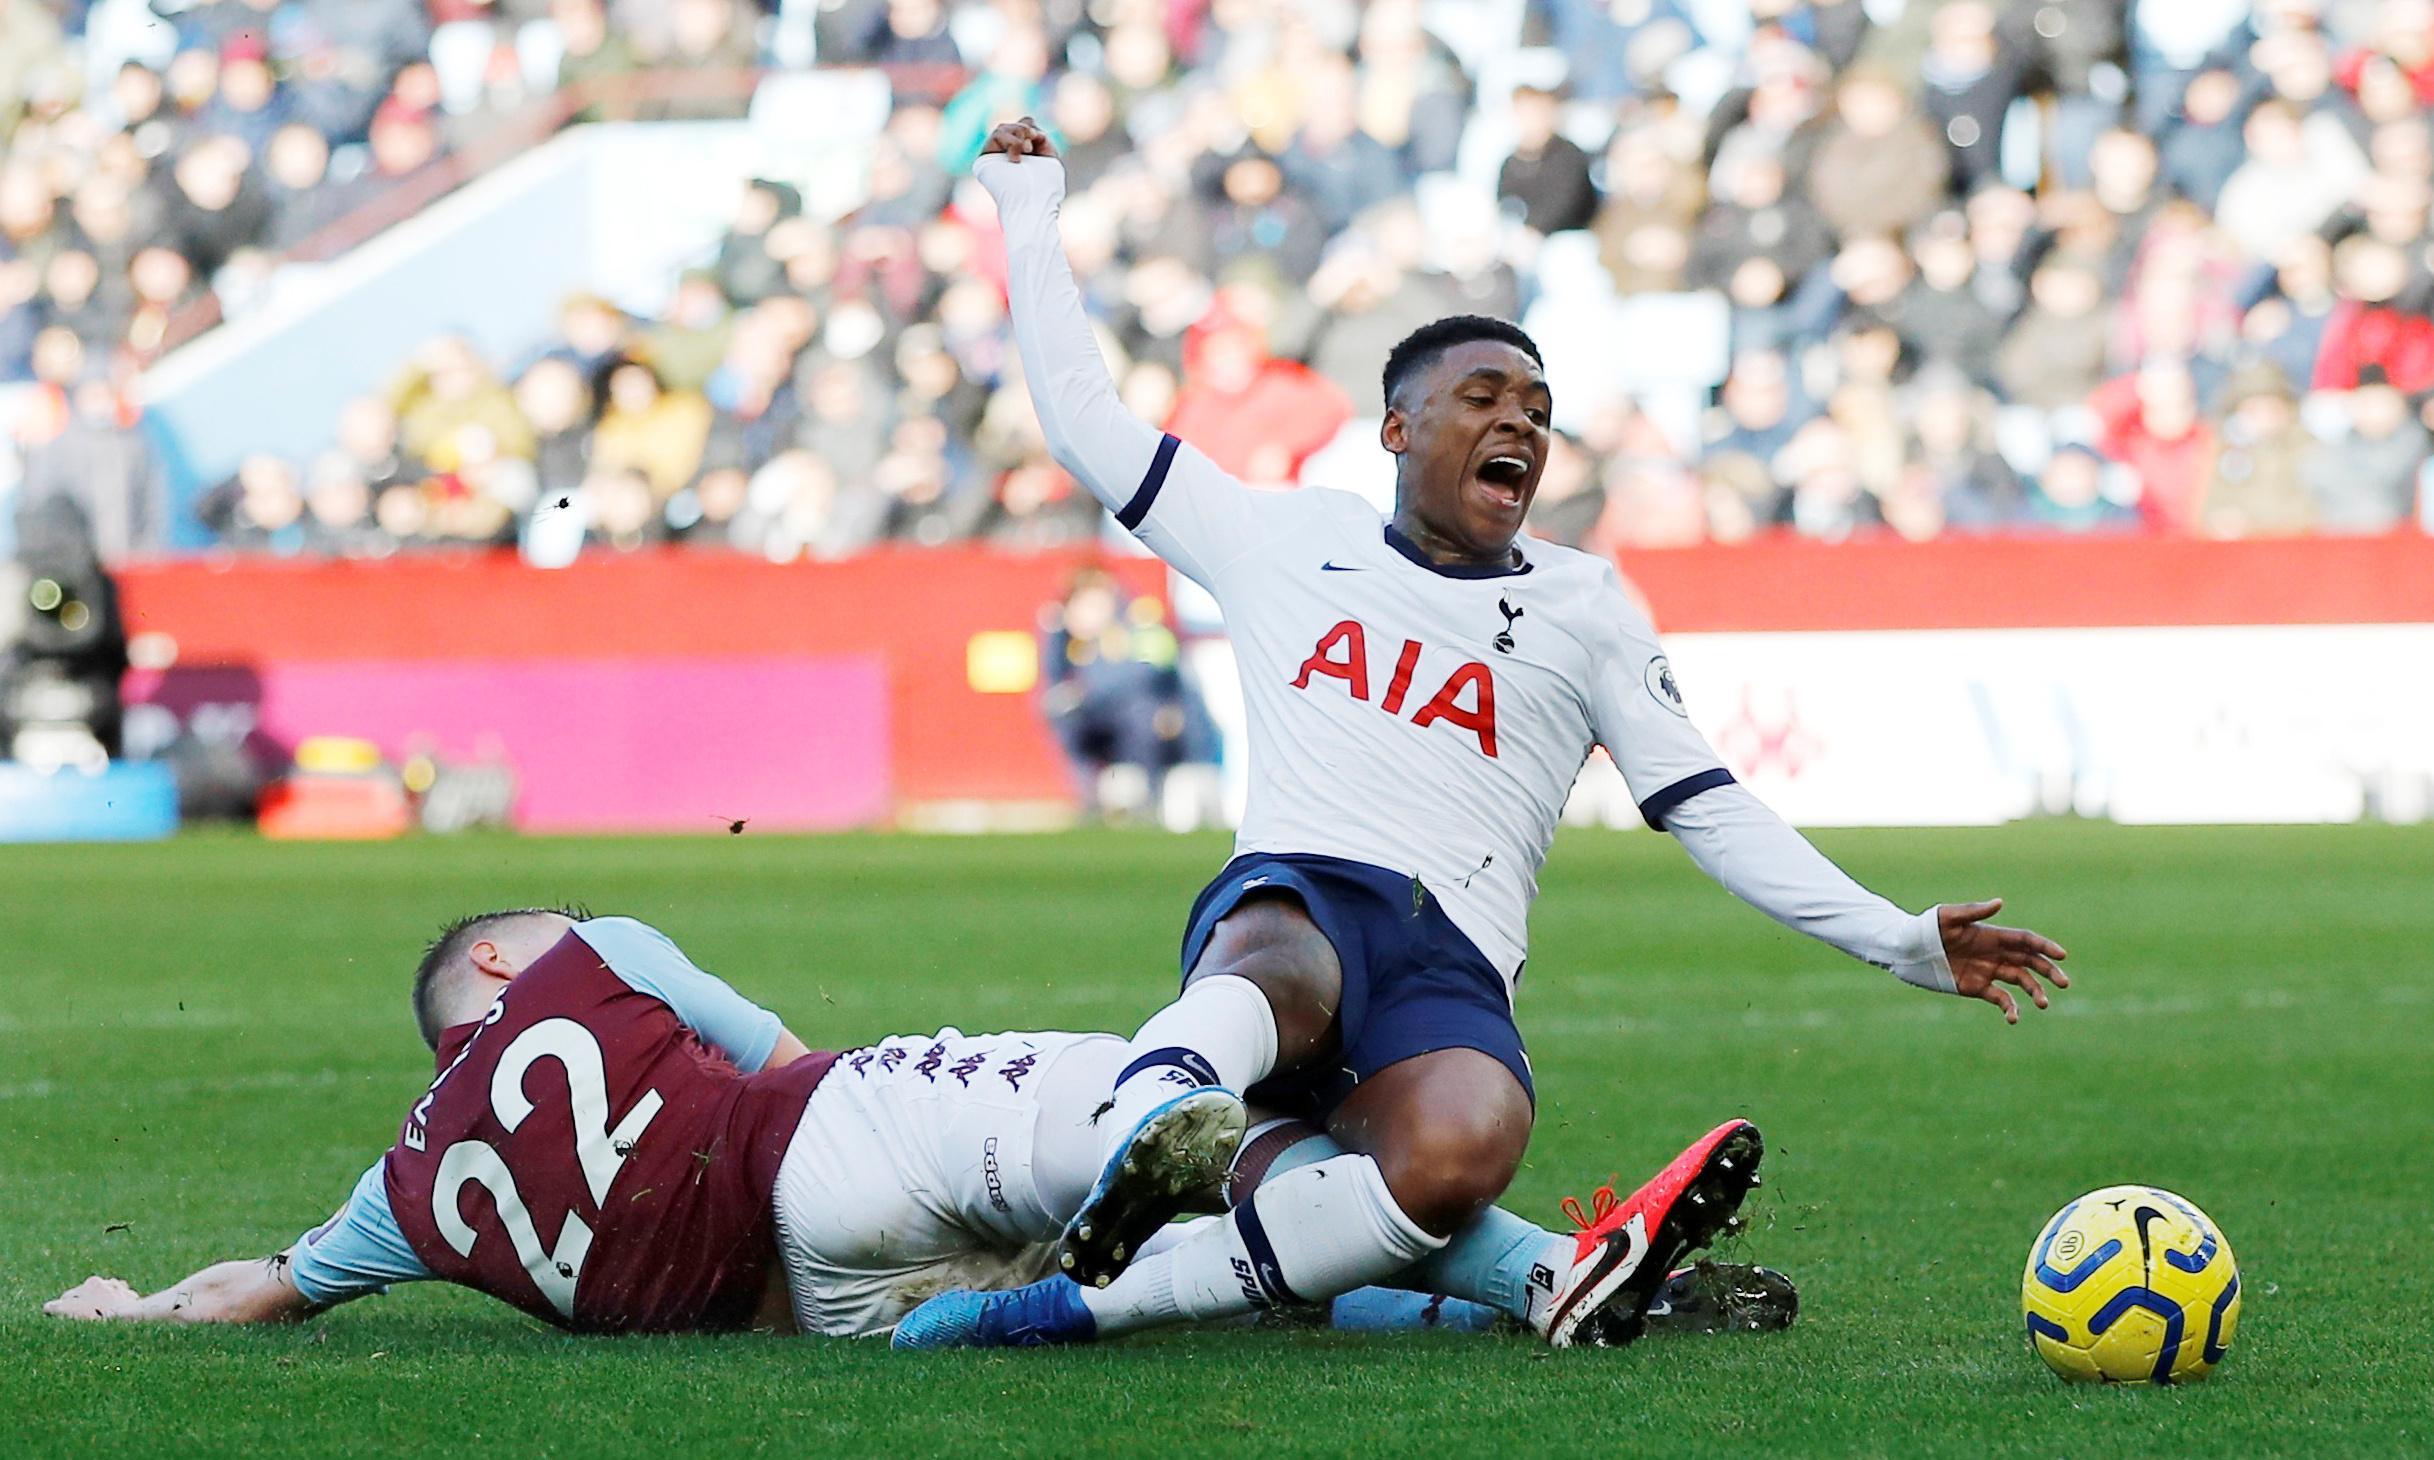 Villa's Dean Smith bemoans VAR-assisted penalty for Tottenham